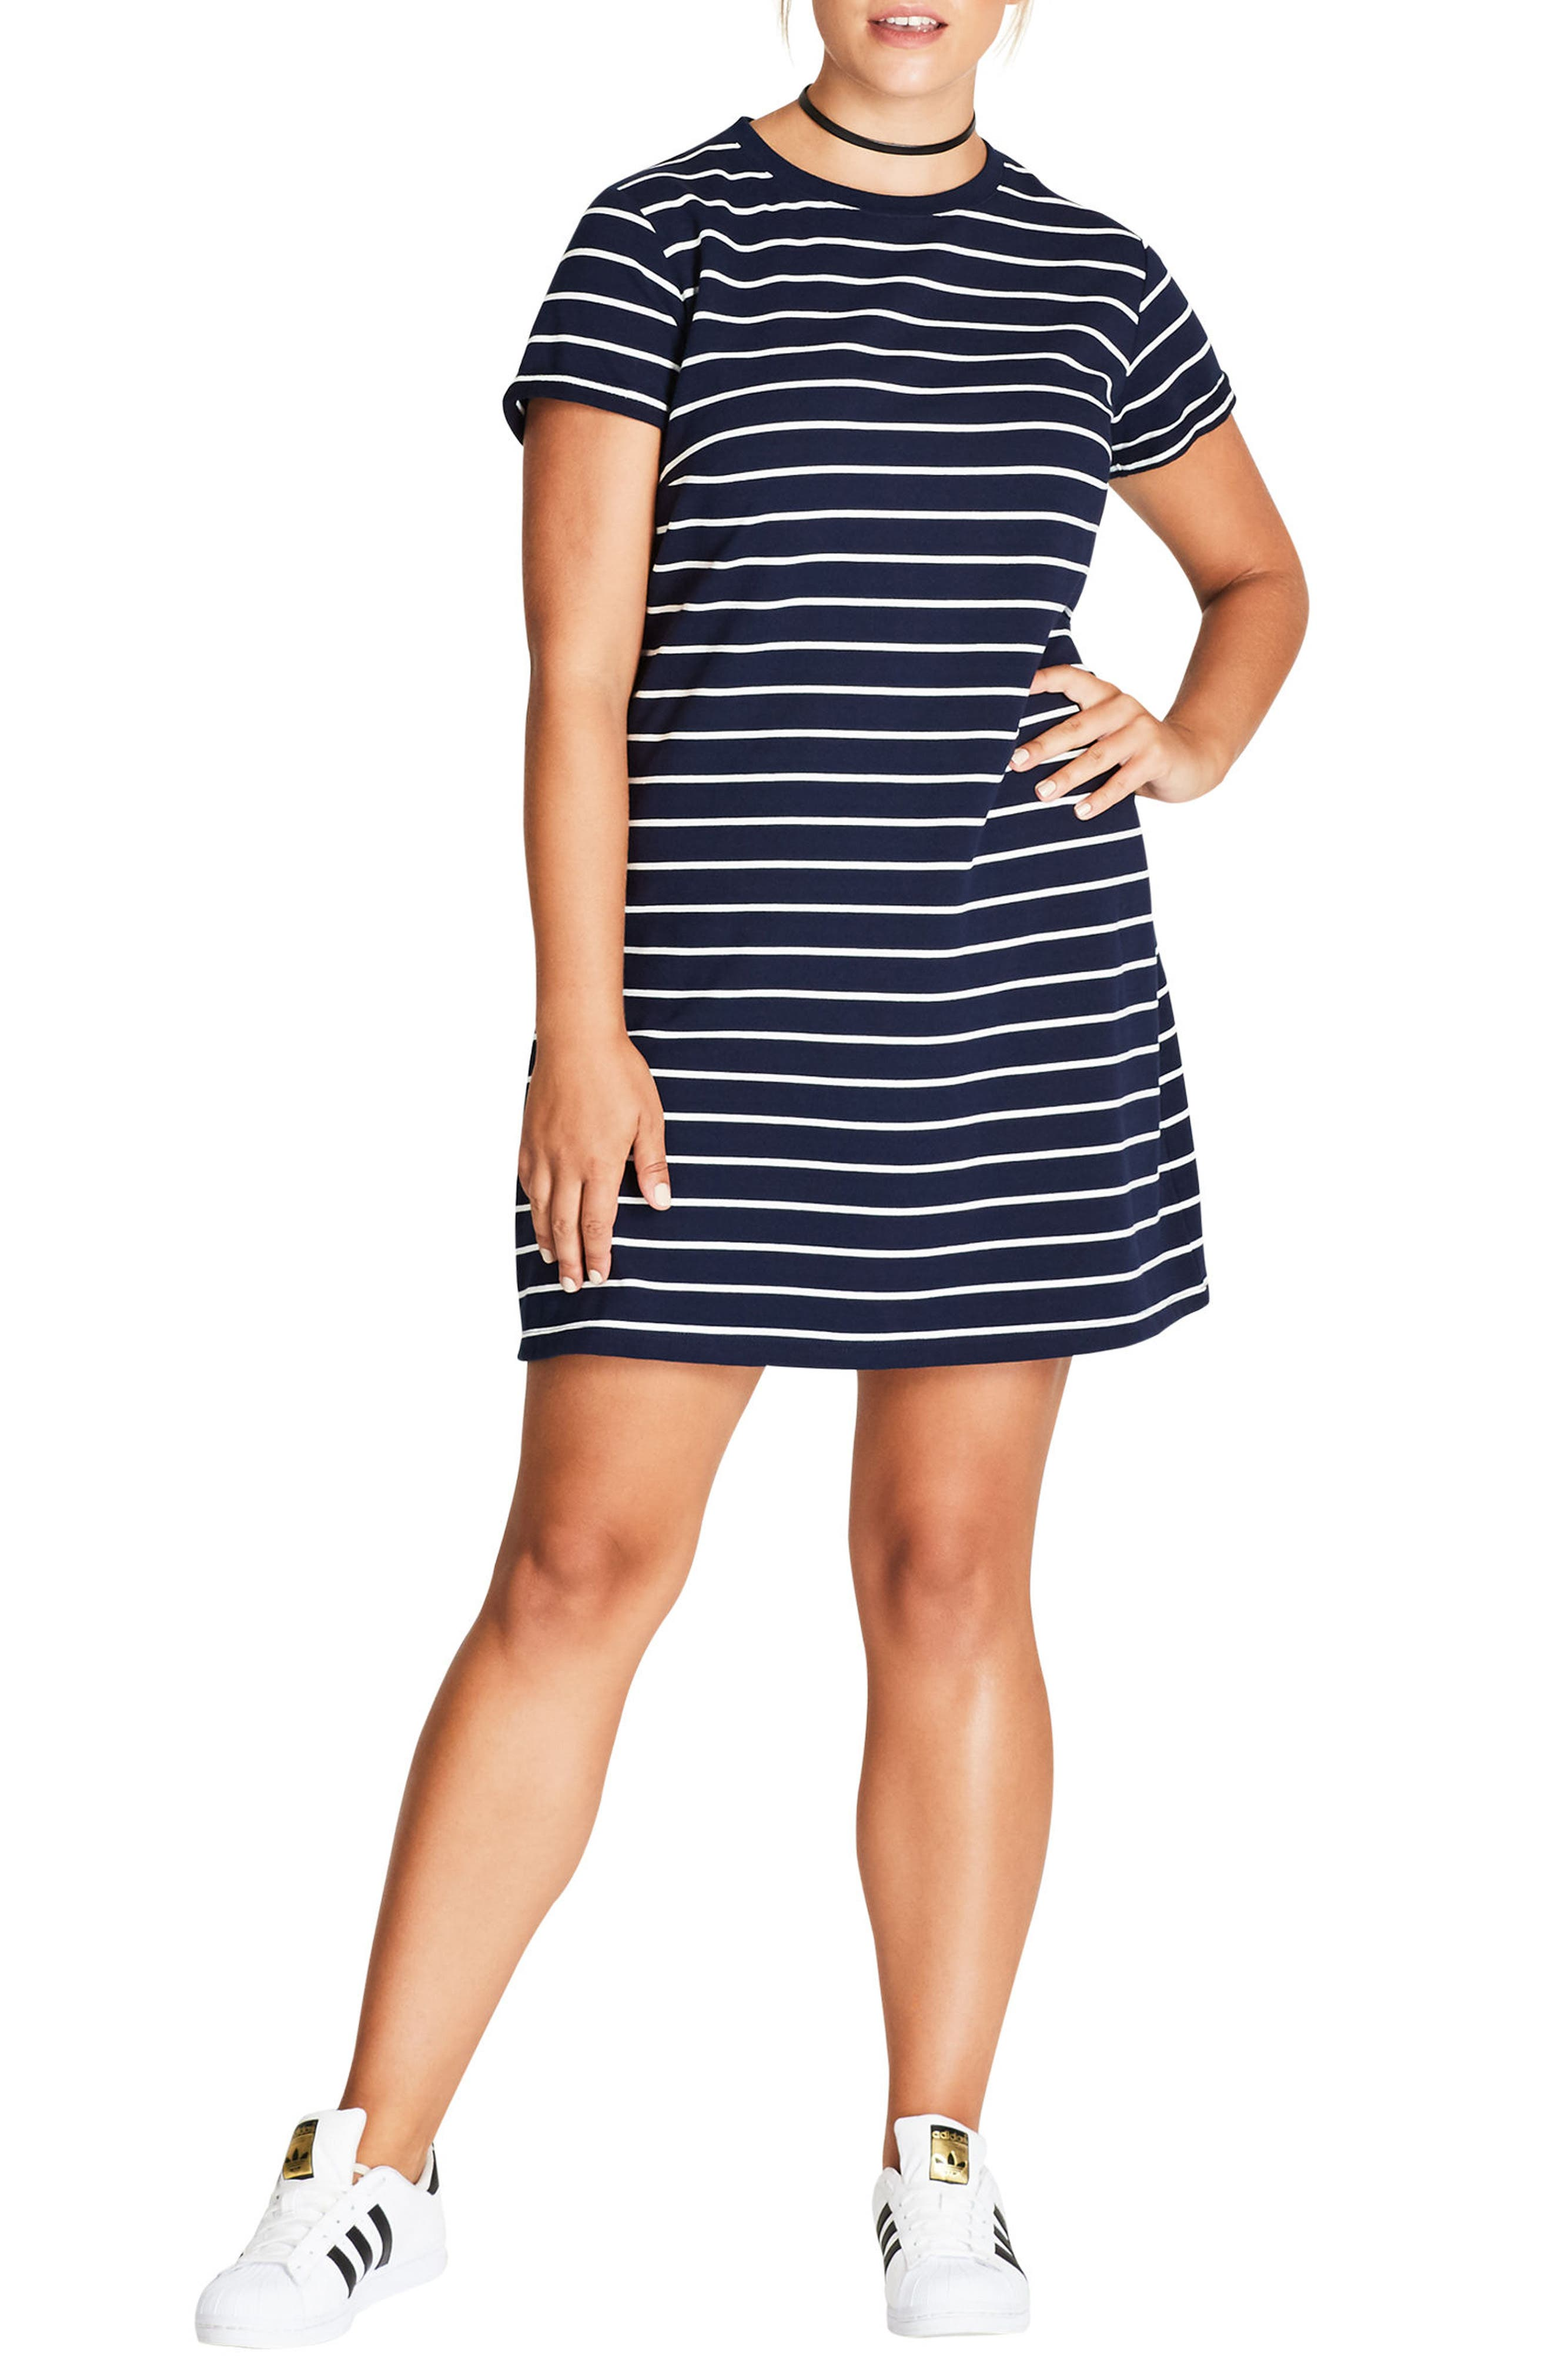 City Chic Stripe T-Shirt Dress (Plus Size)